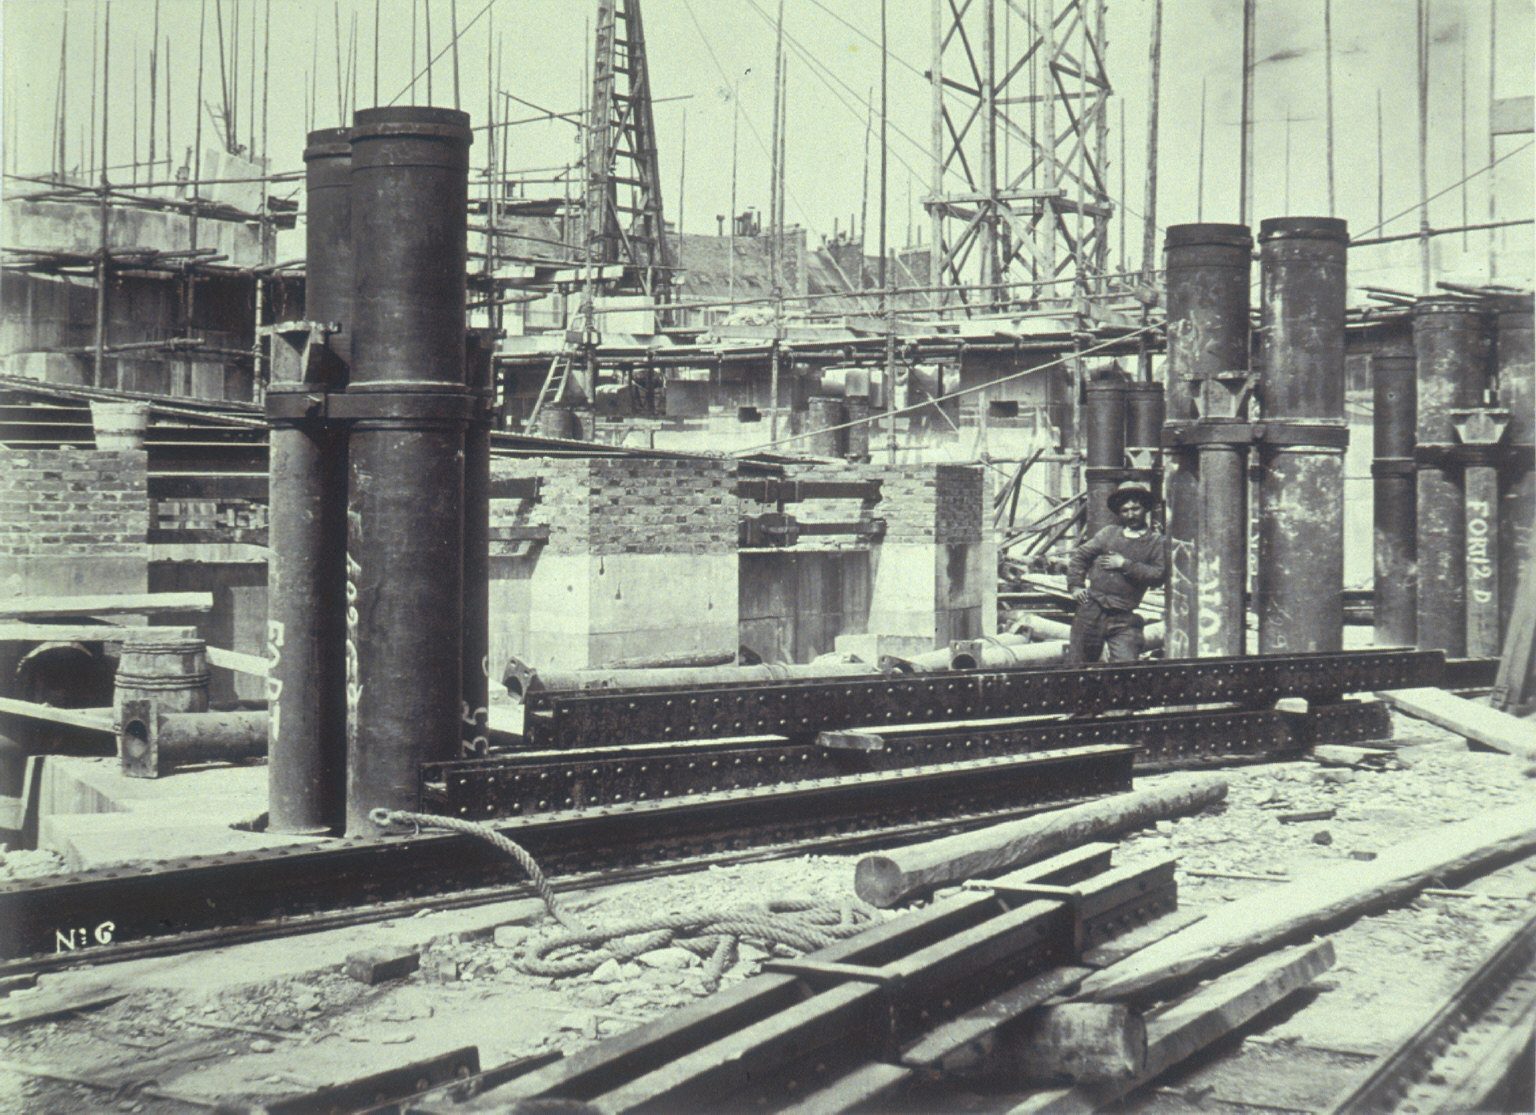 Footings, construction of Paris Opera